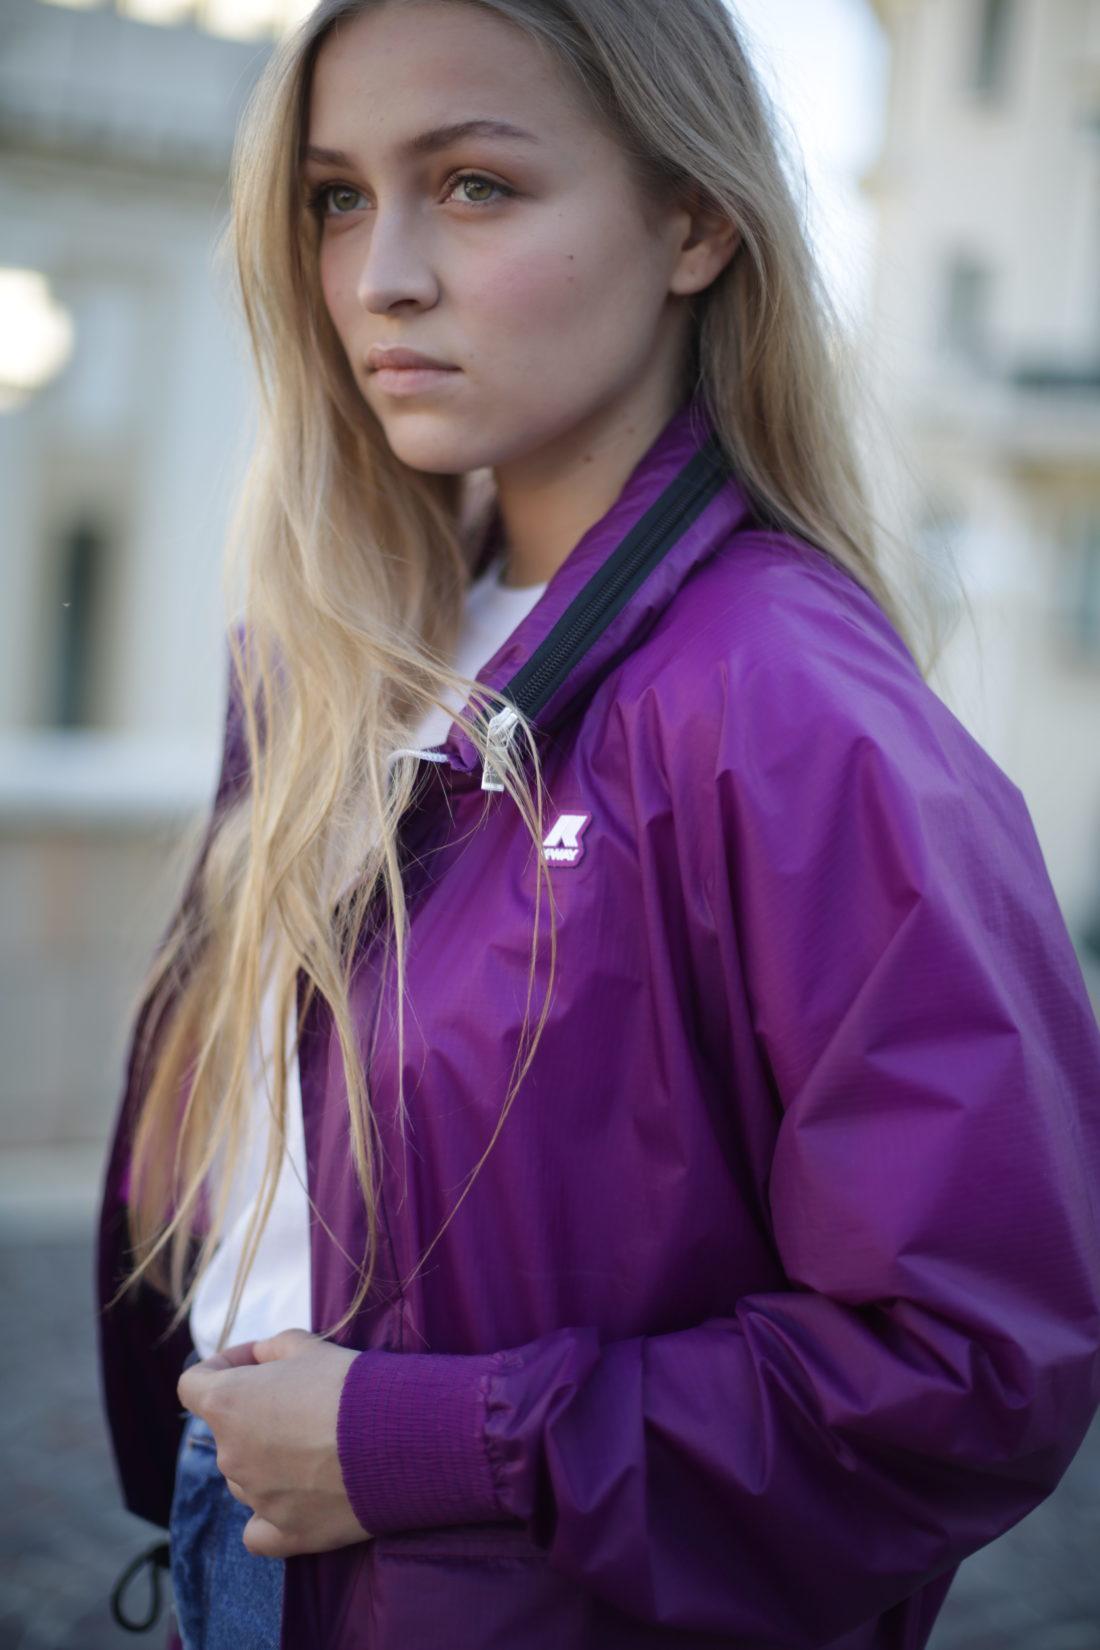 purple jacket kway cheveux longs blonds coiffure studio texture beachhair